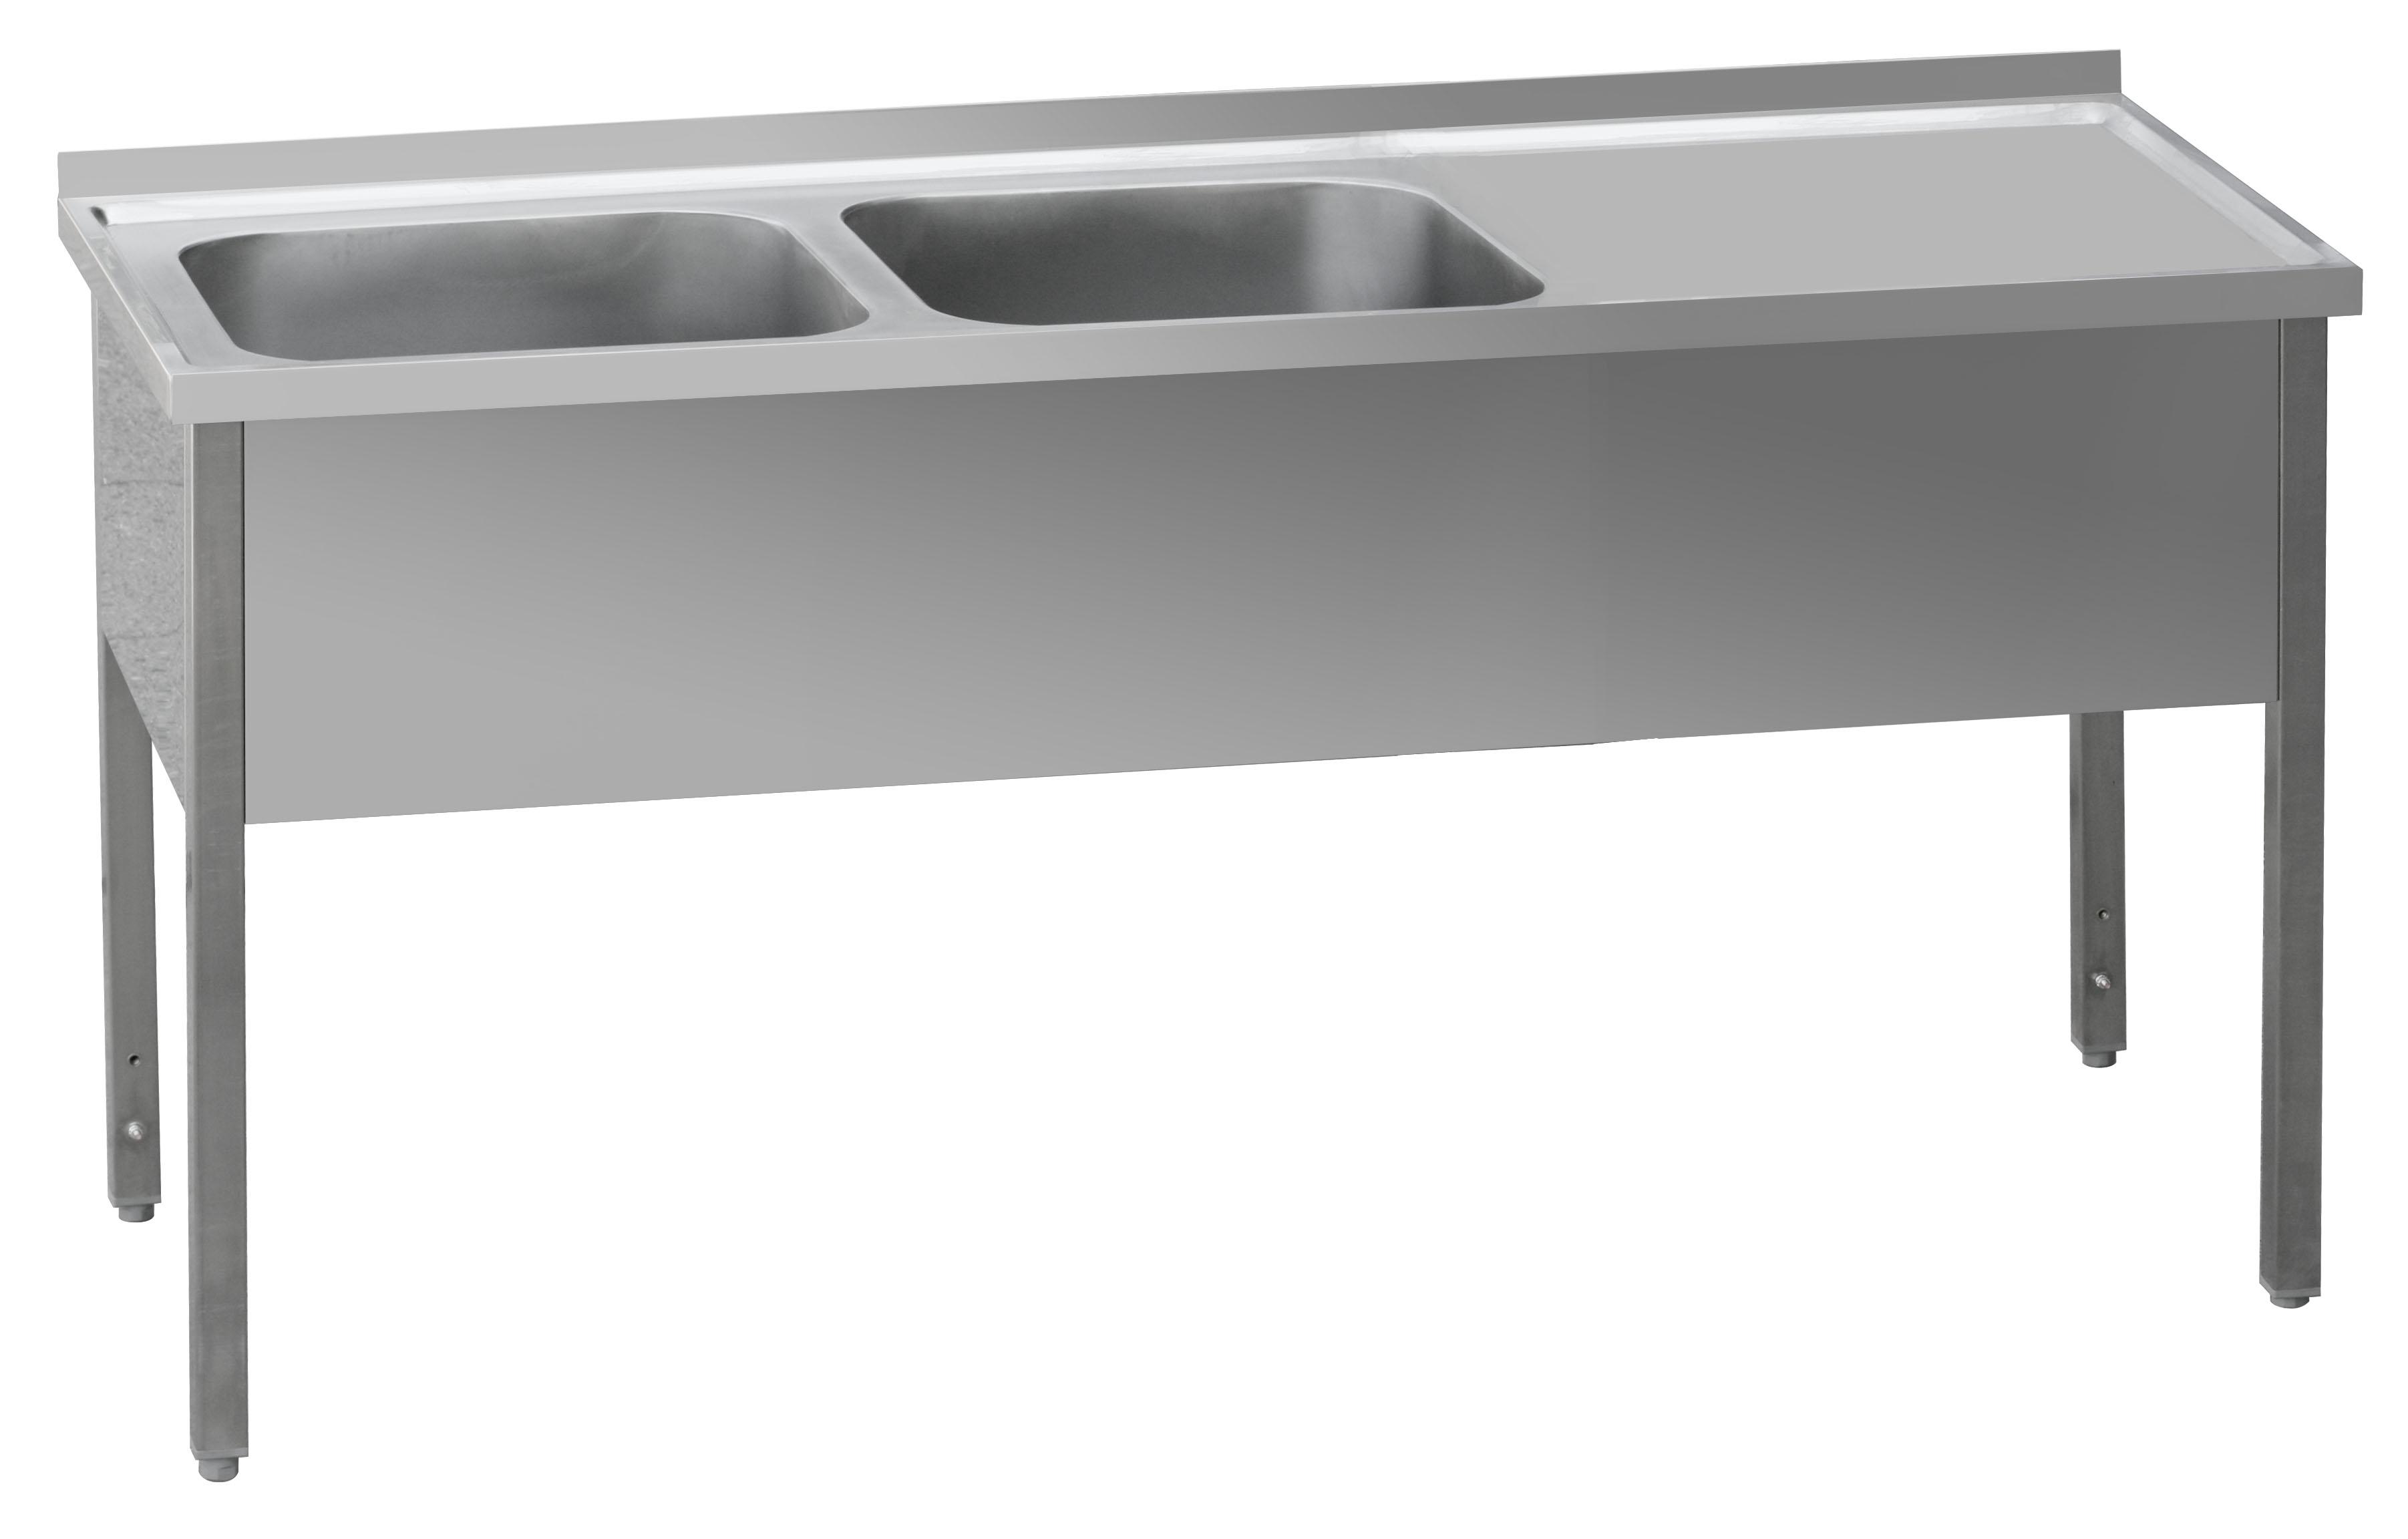 Stůl mycí dvoudřez MSDOP 160x70x90 REDFOX